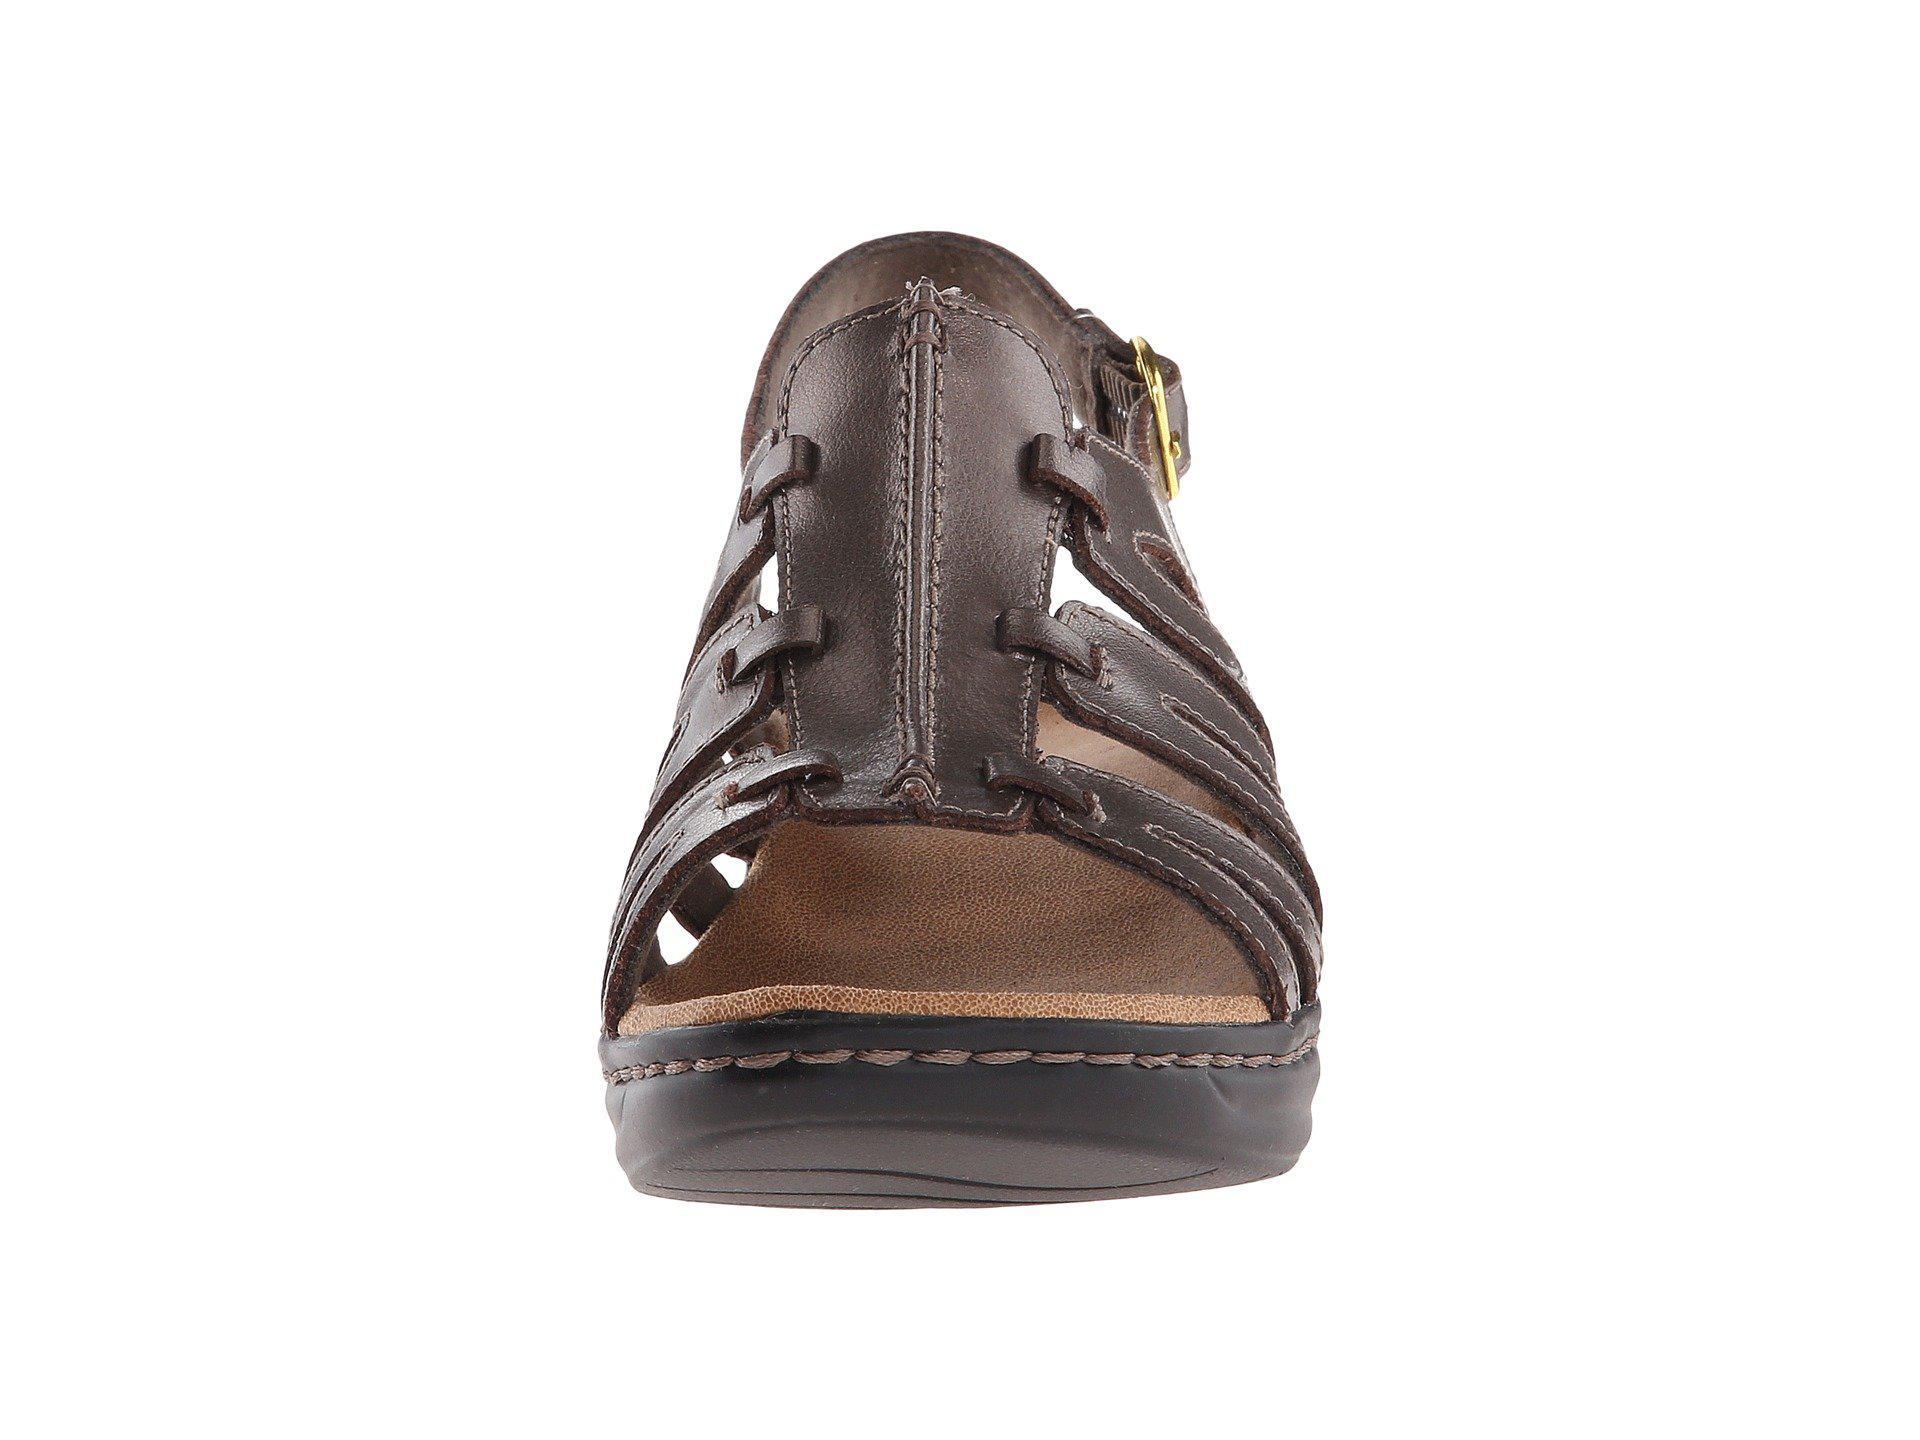 d473f0943ca3a8 Clarks - Metallic Lexi Marigold Q (white Leather) Women s Sandals - Lyst.  View fullscreen